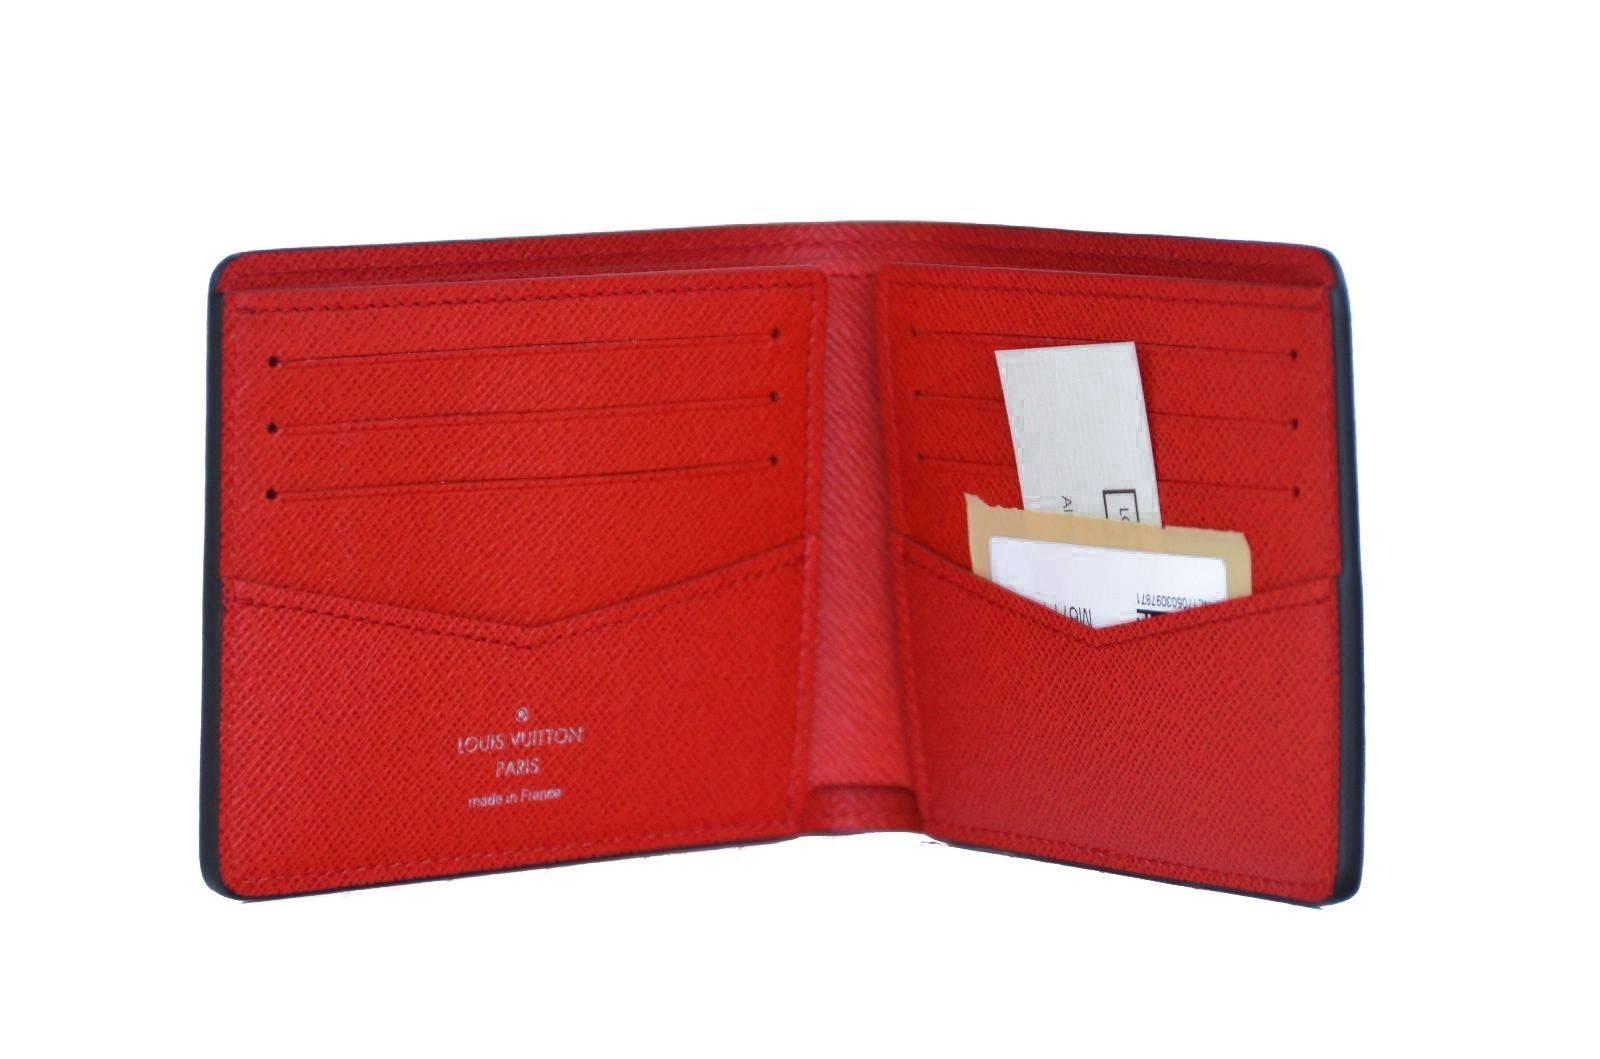 13f978f814c Louis Vuitton x Supreme Slender Red Epi Wallet NEW